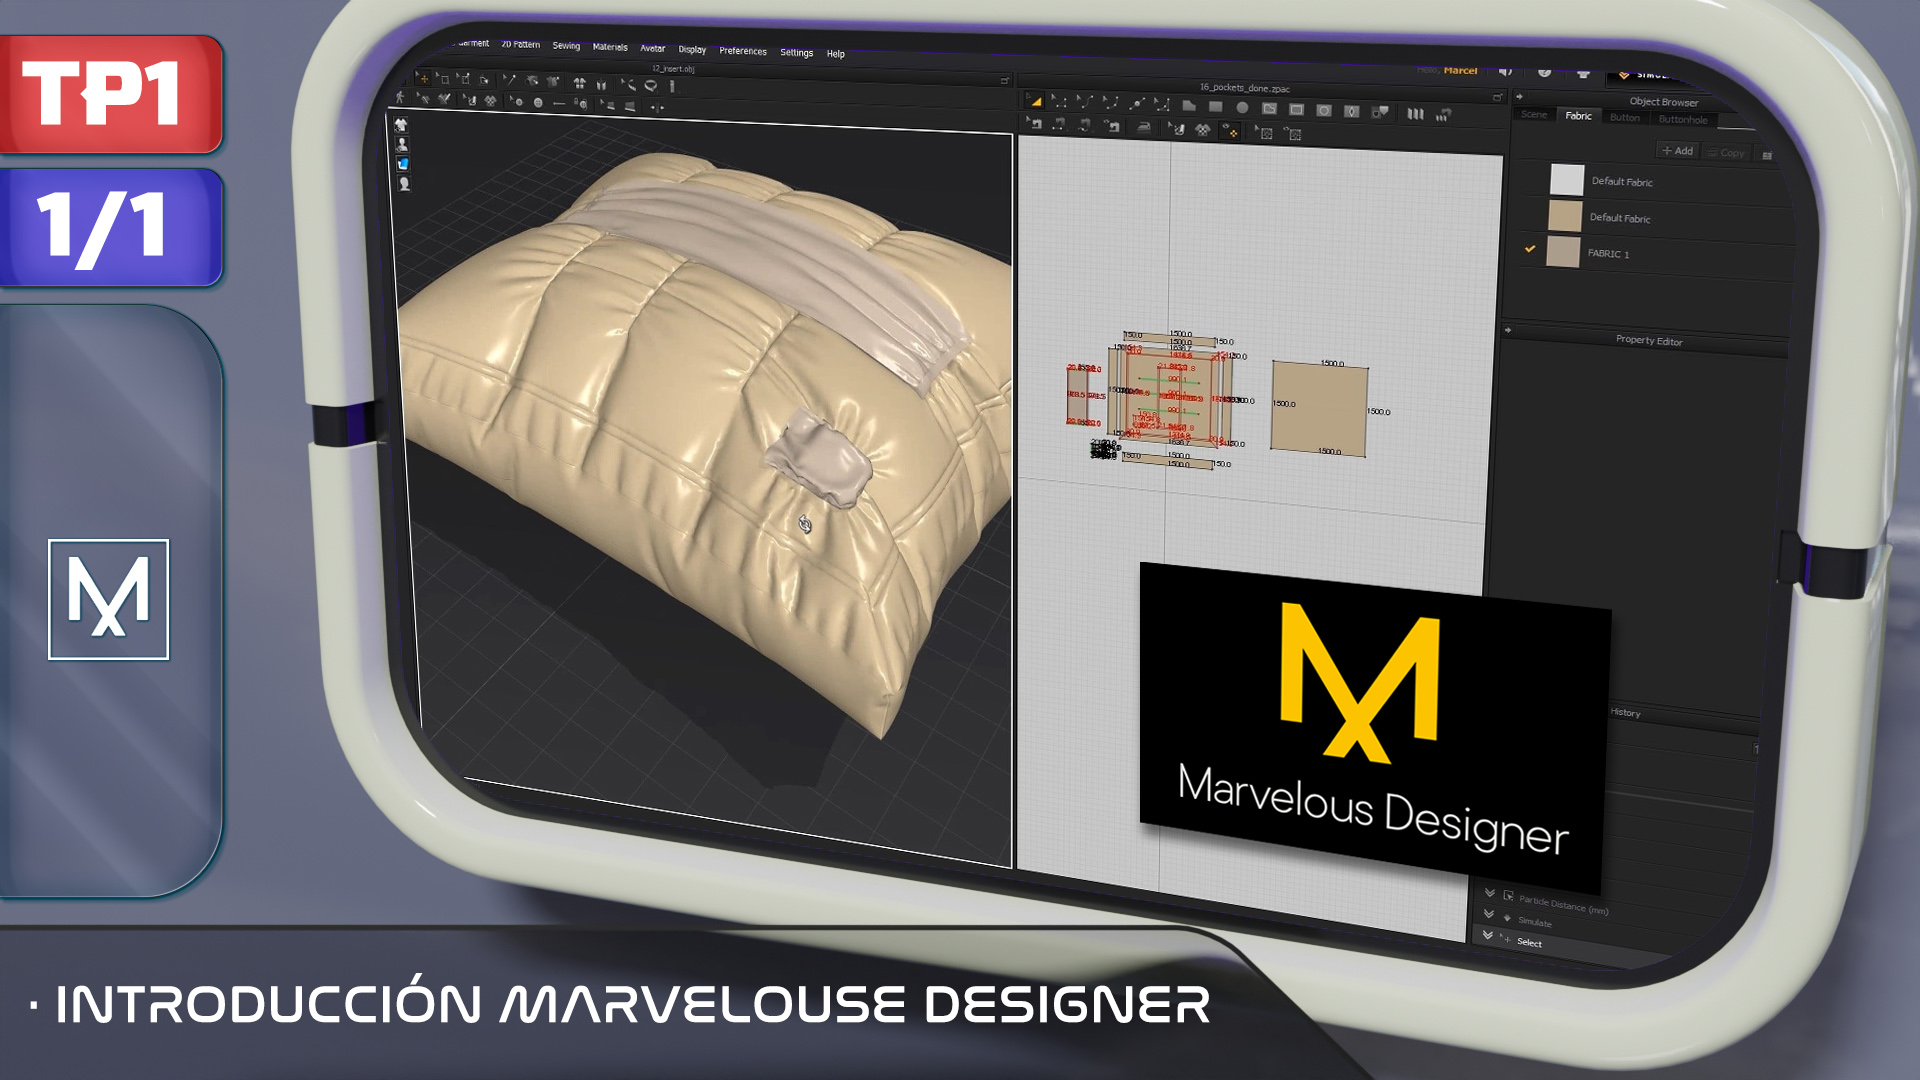 Introduccion Marvelous Designer